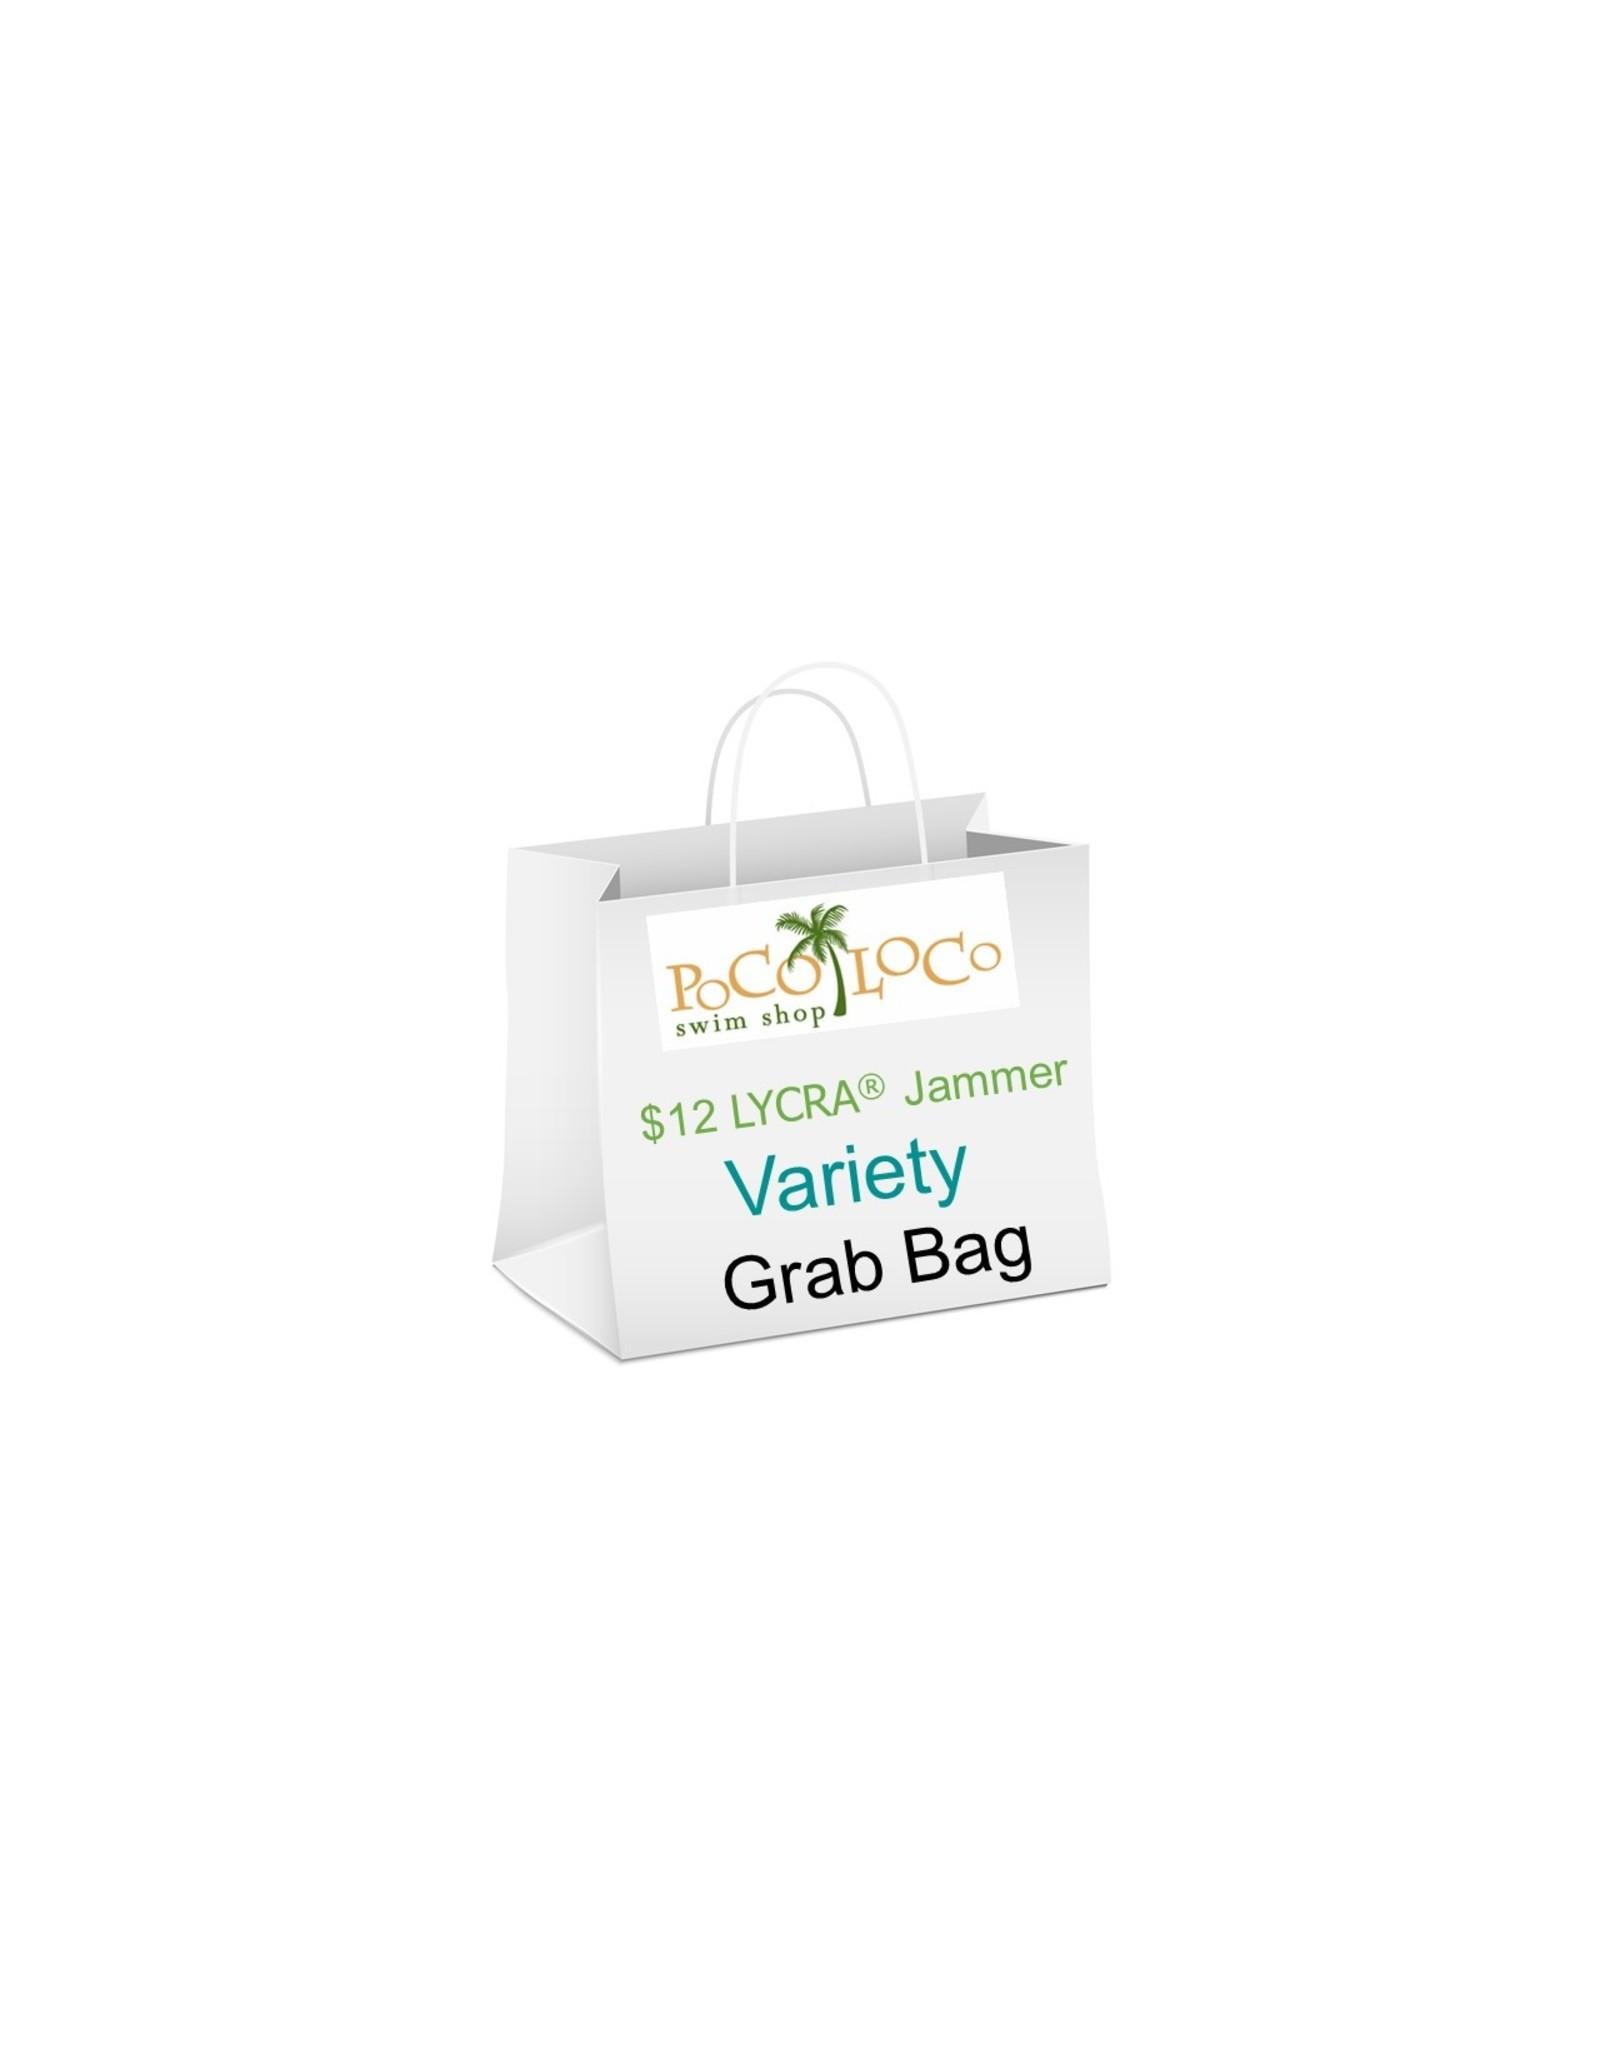 LYCRA® VARIETY GRAB BAG JAMMER